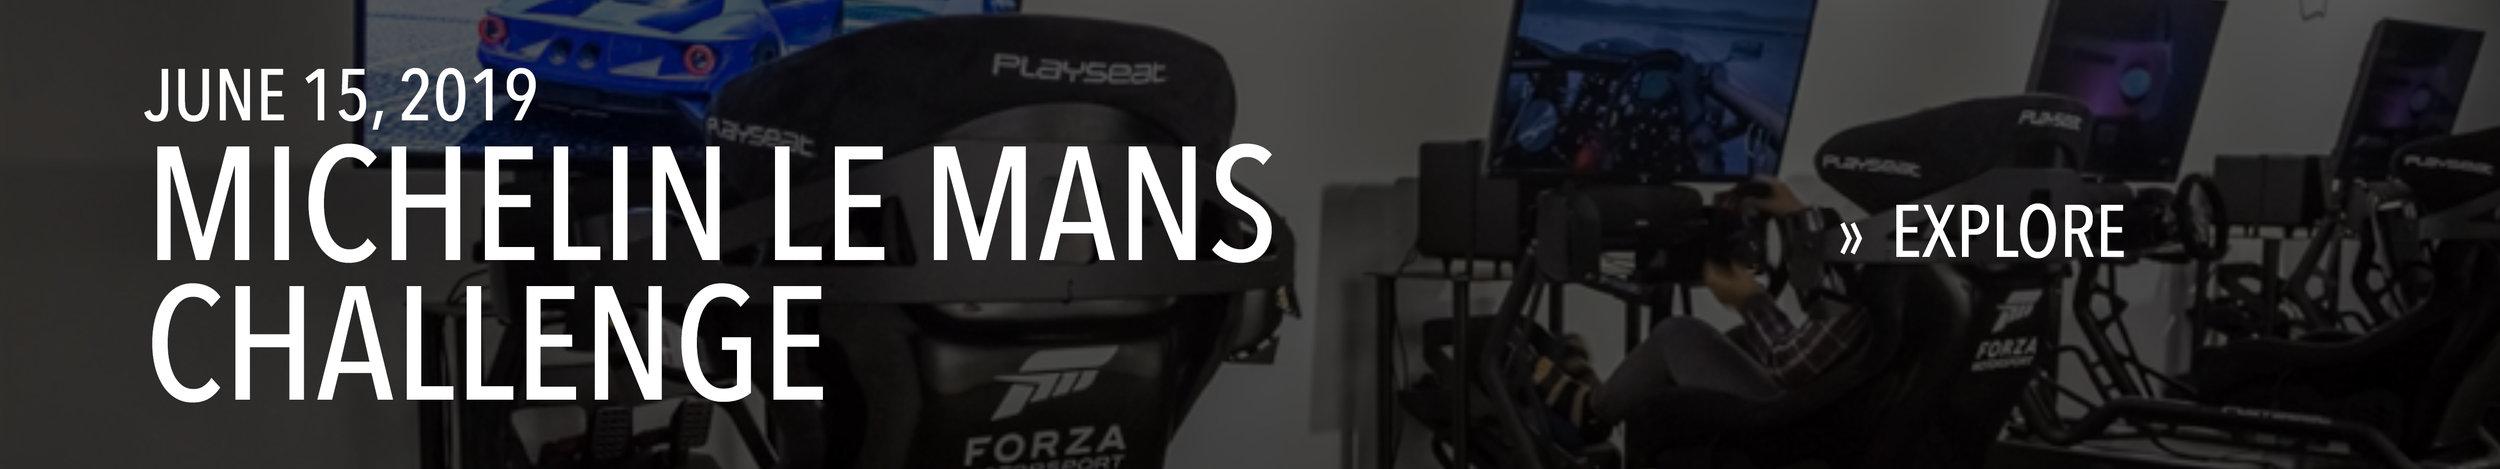 Michelin 24 Hours Le Mans Challenge on June 15, 2019.